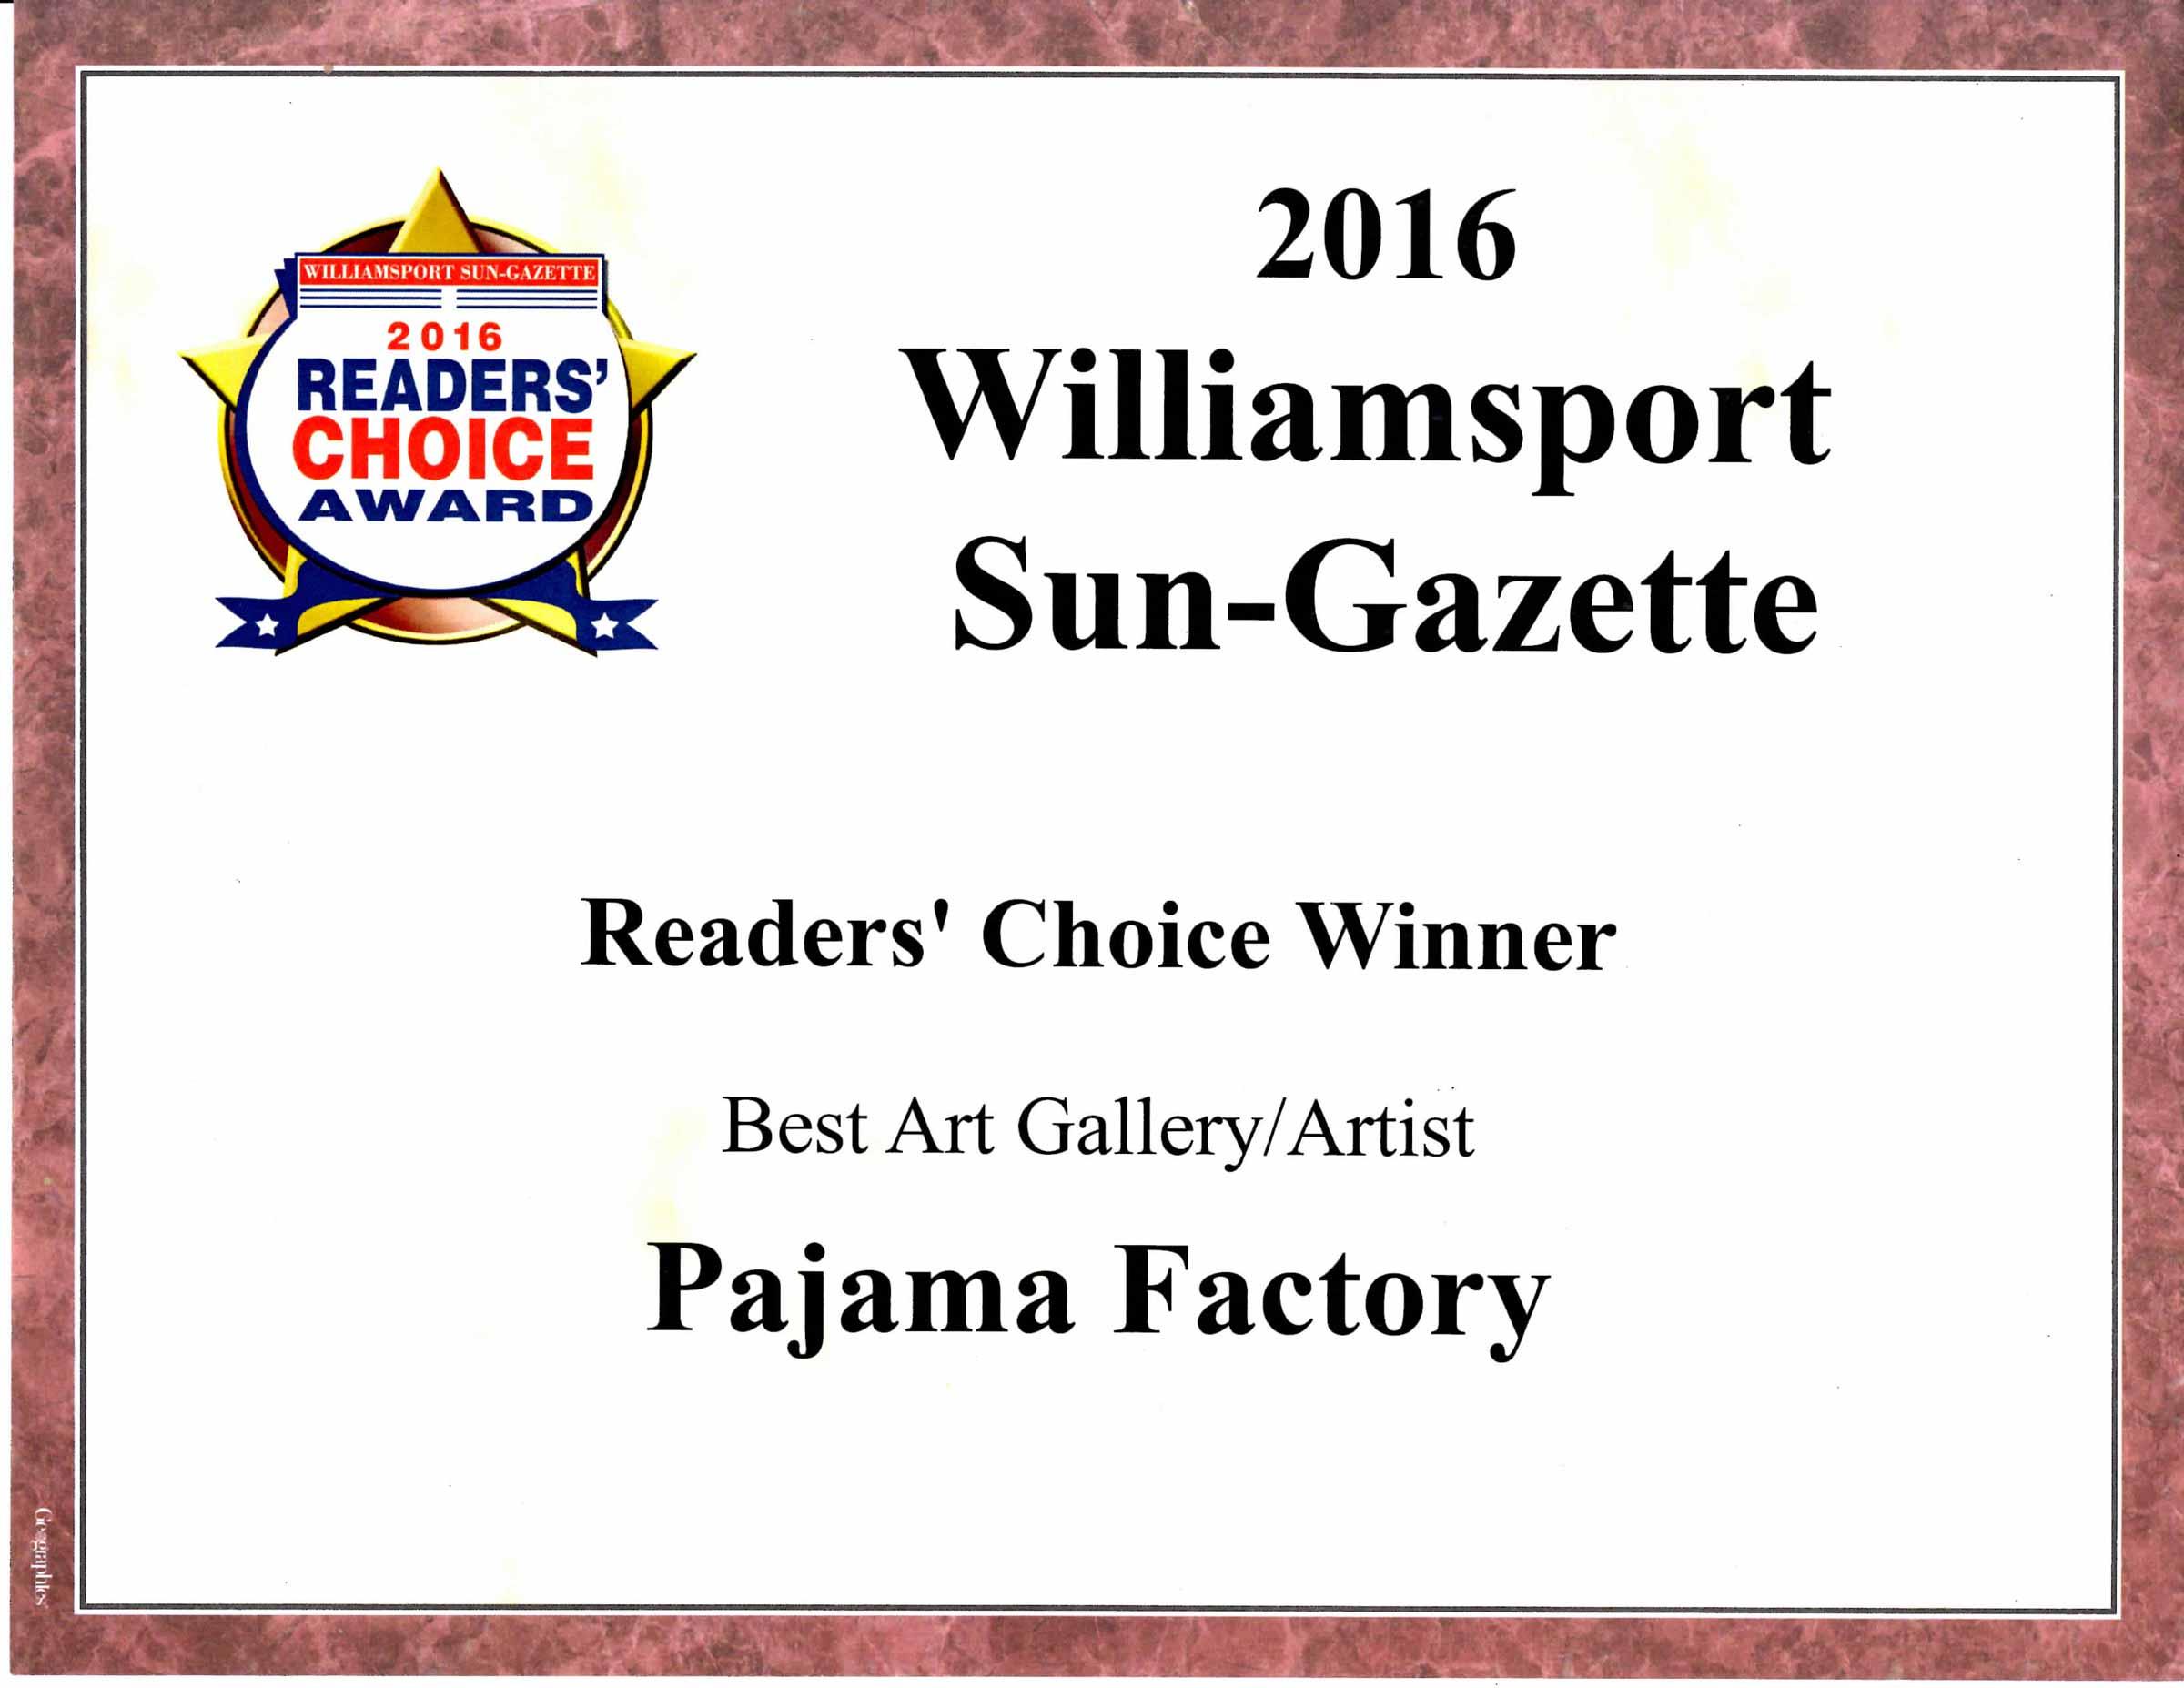 SunGazette -Reader's Choice Winner